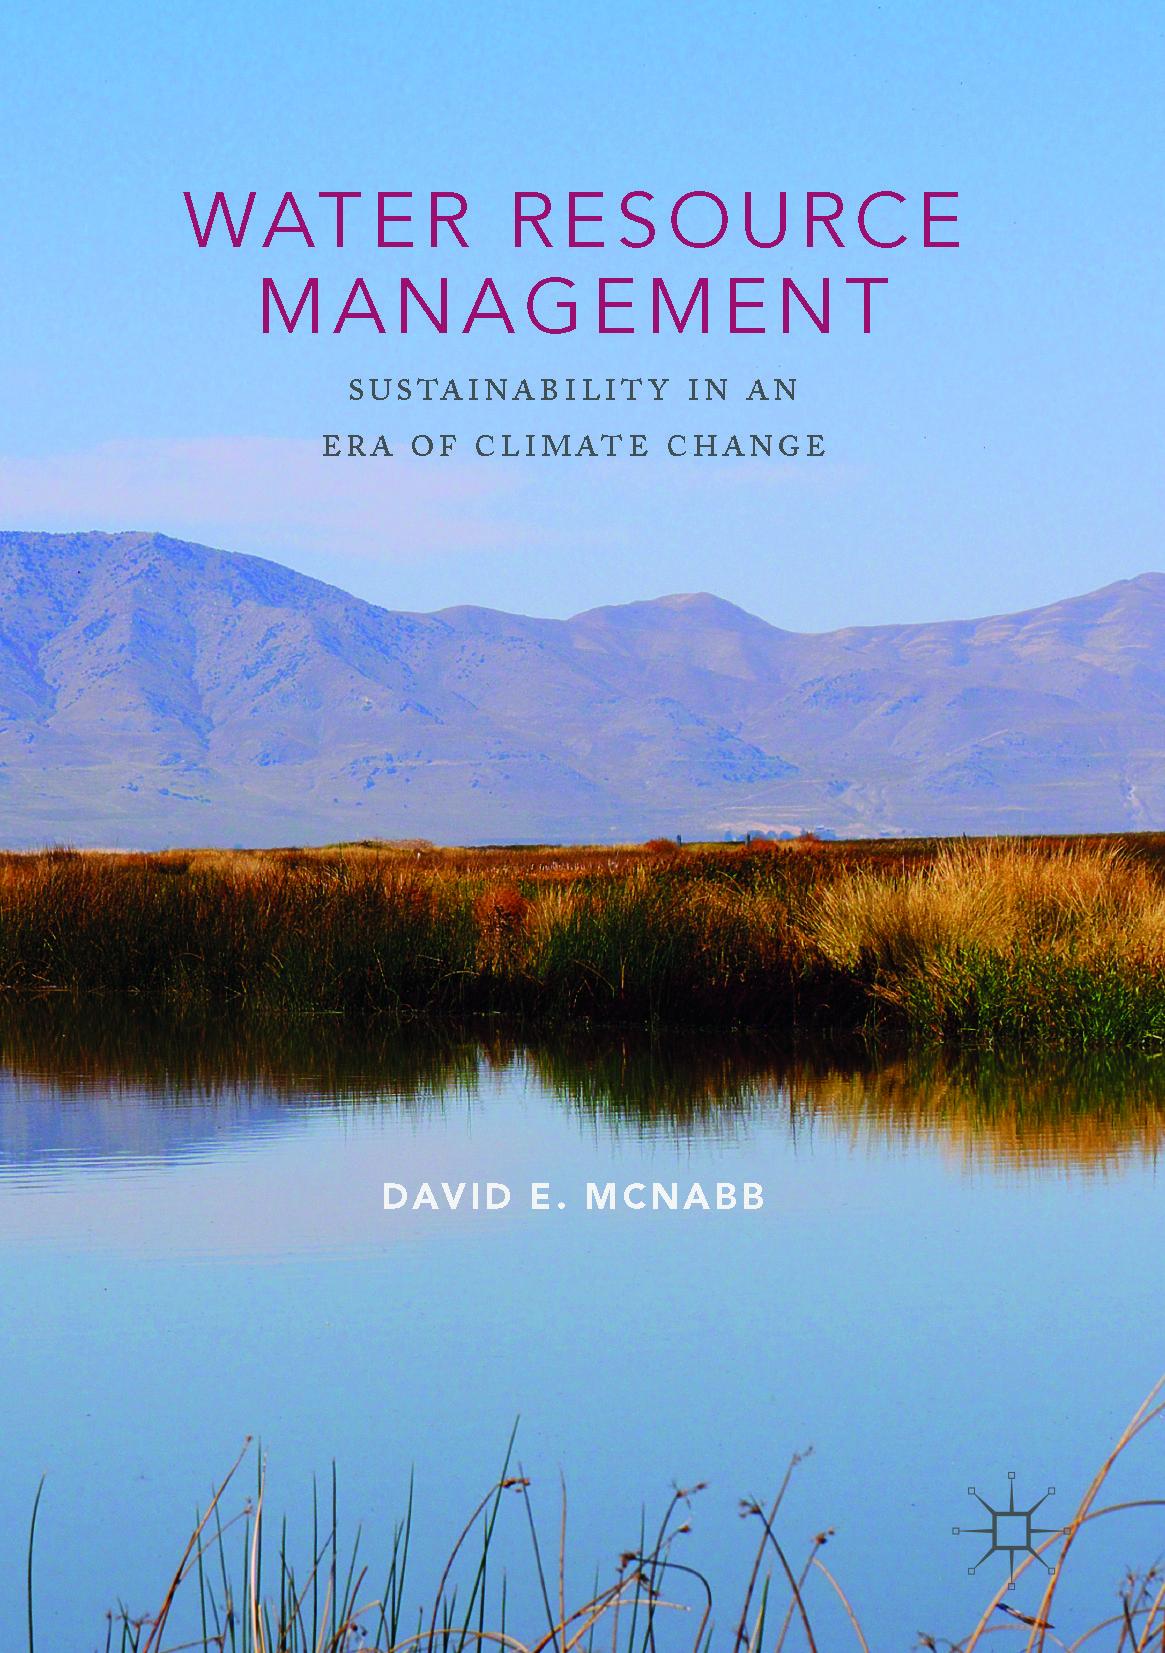 McNabb, David E. - Water Resource Management, ebook